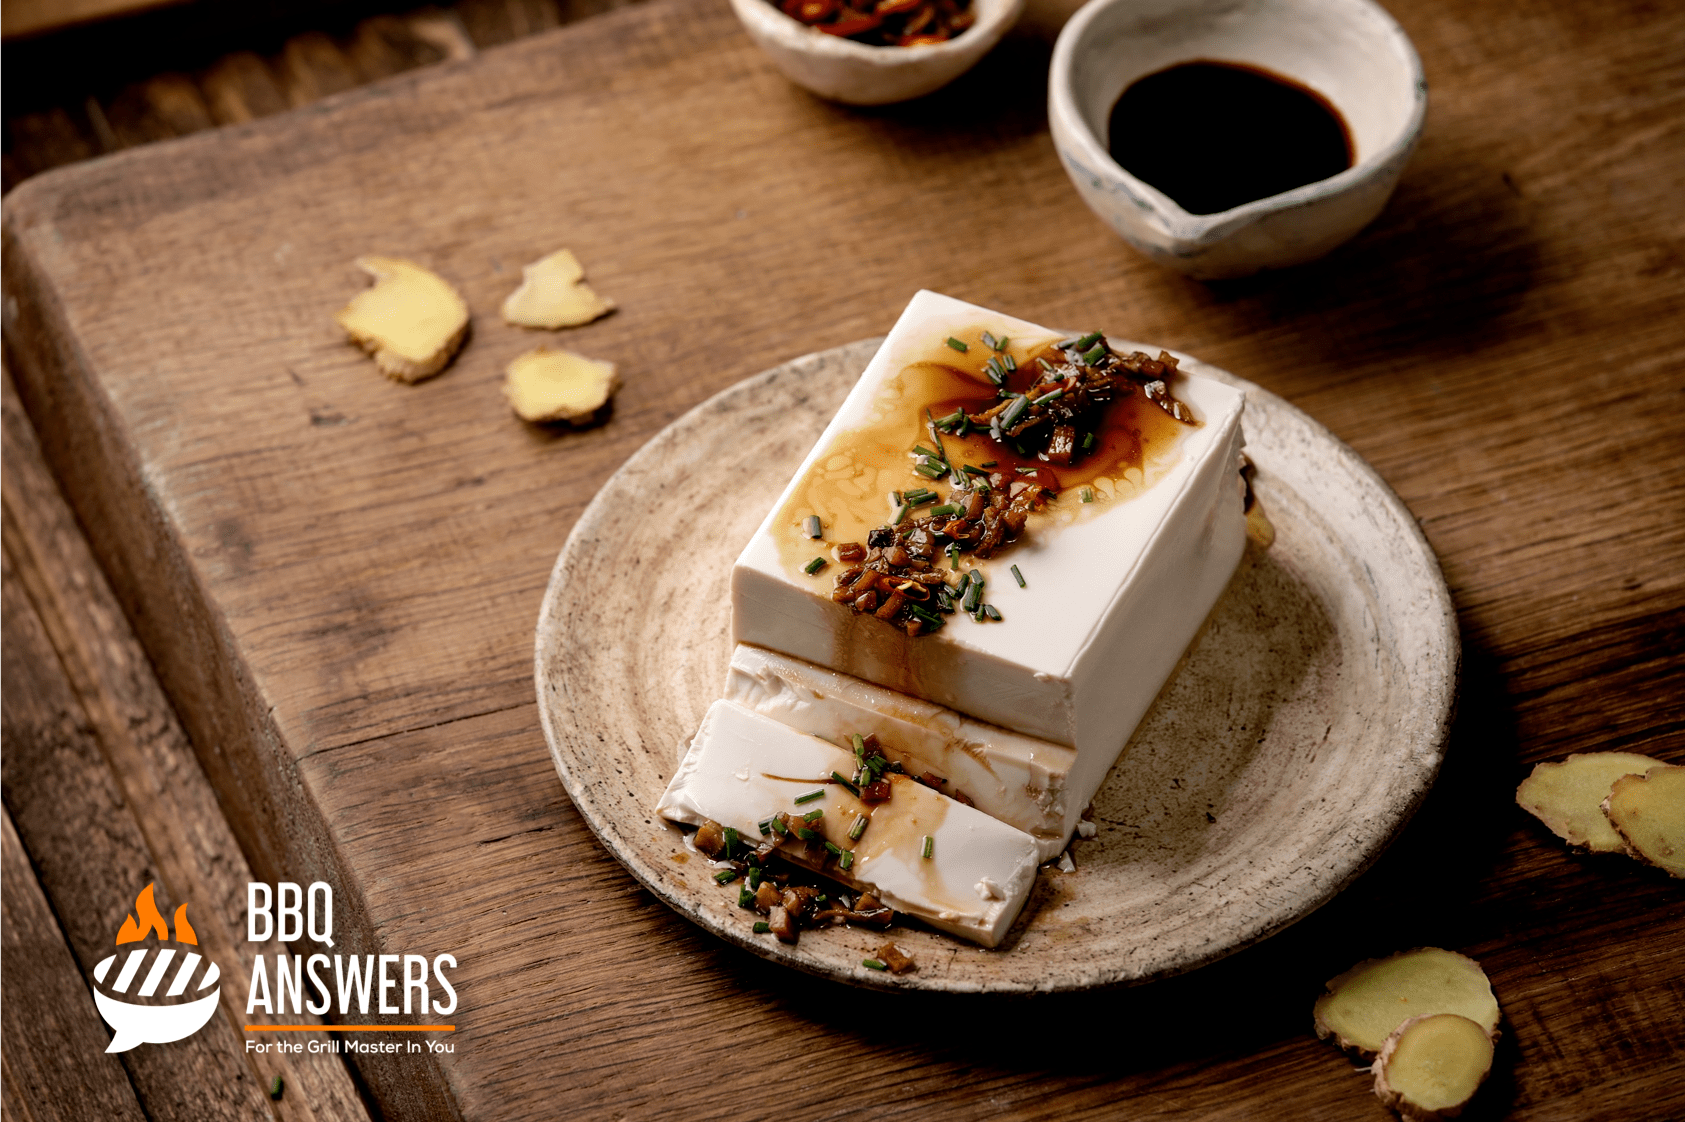 Vegan Cheese from Fermented Tofu | BBQanswers